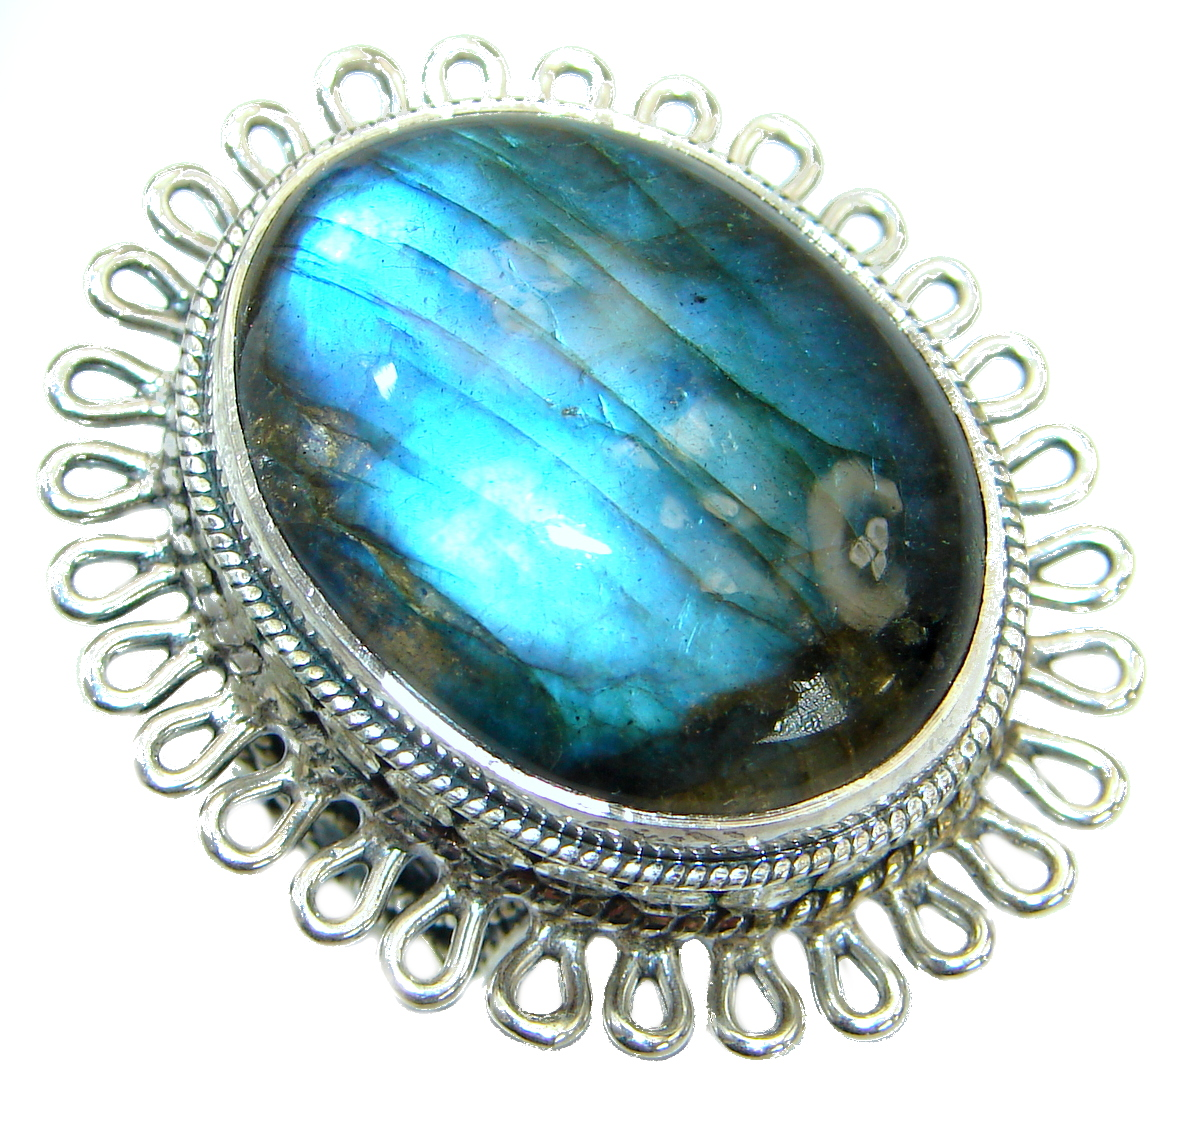 Huge 45ct Blue Fire Labradorite .925 Sterling Silver handmade ring size 6 1/2